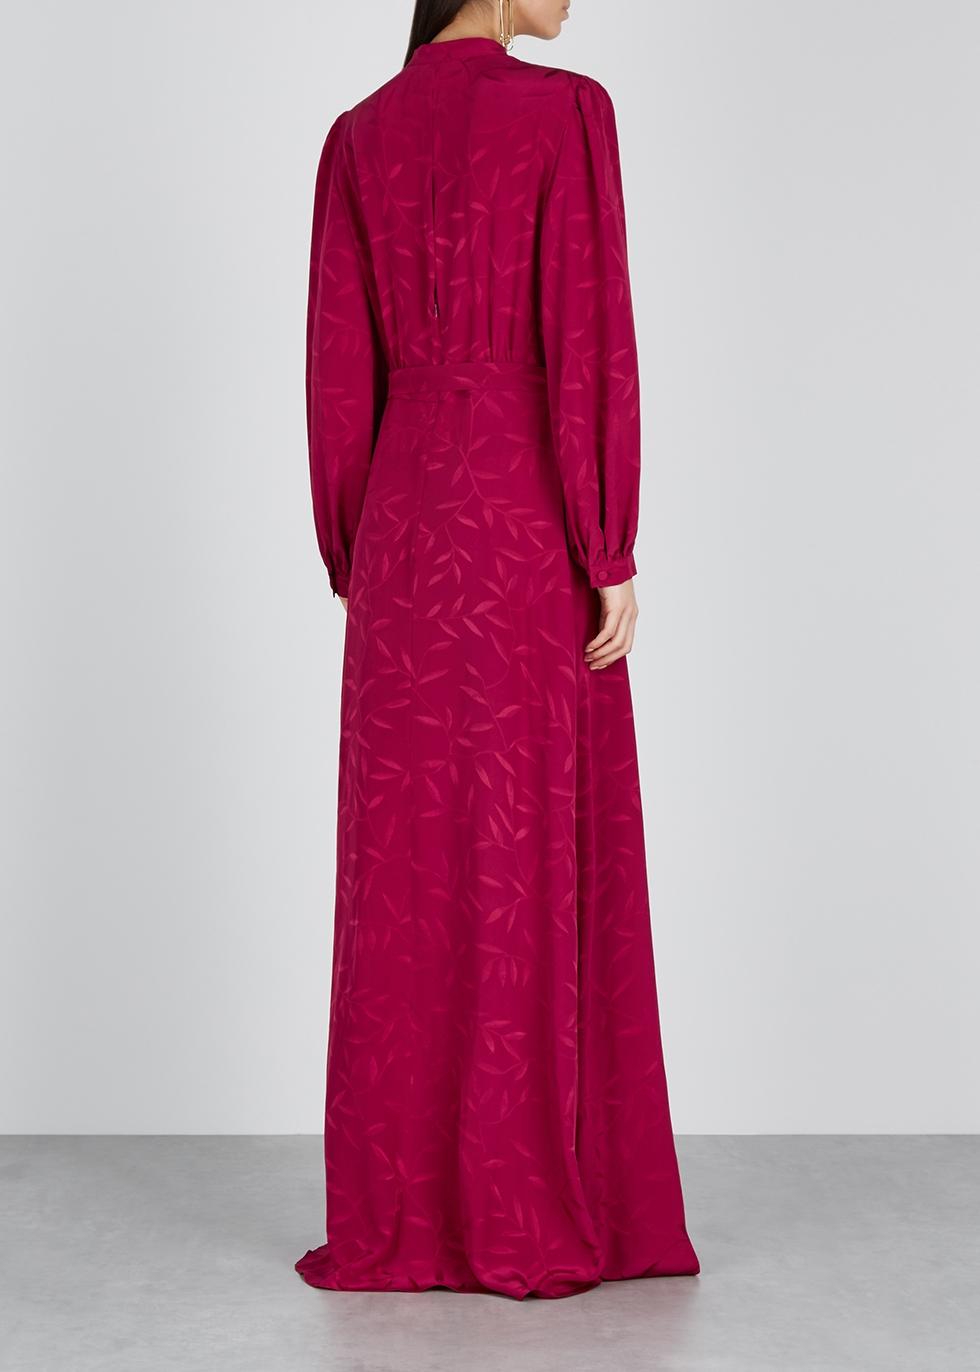 Armonia bordeaux silk jacquard dress - Raquel Diniz